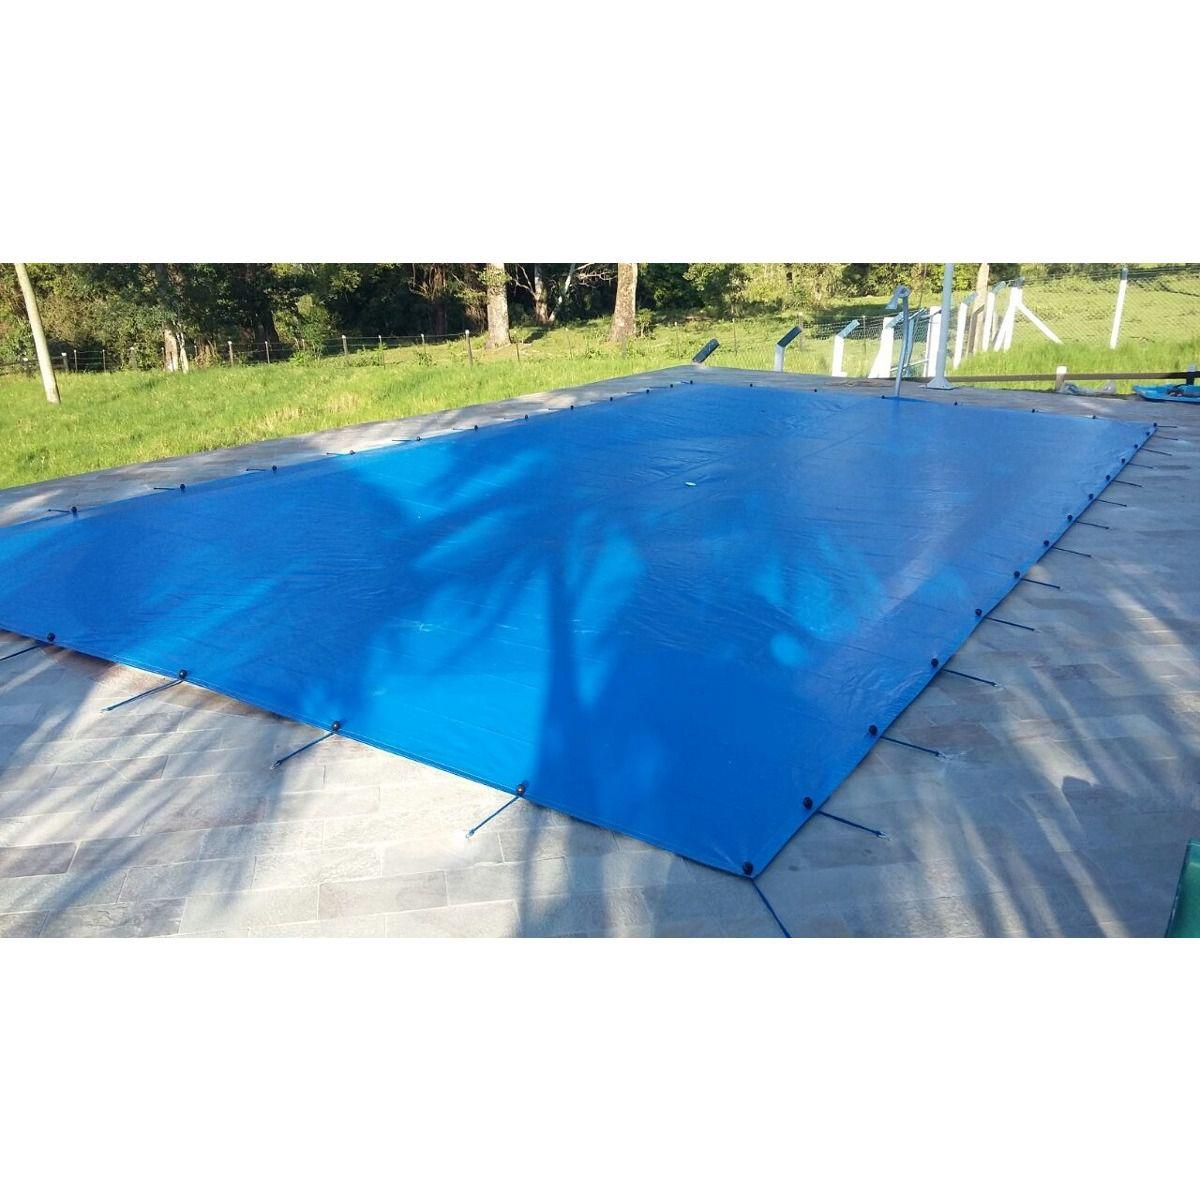 Lona Polietileno Azul 300 Micras - 8x5